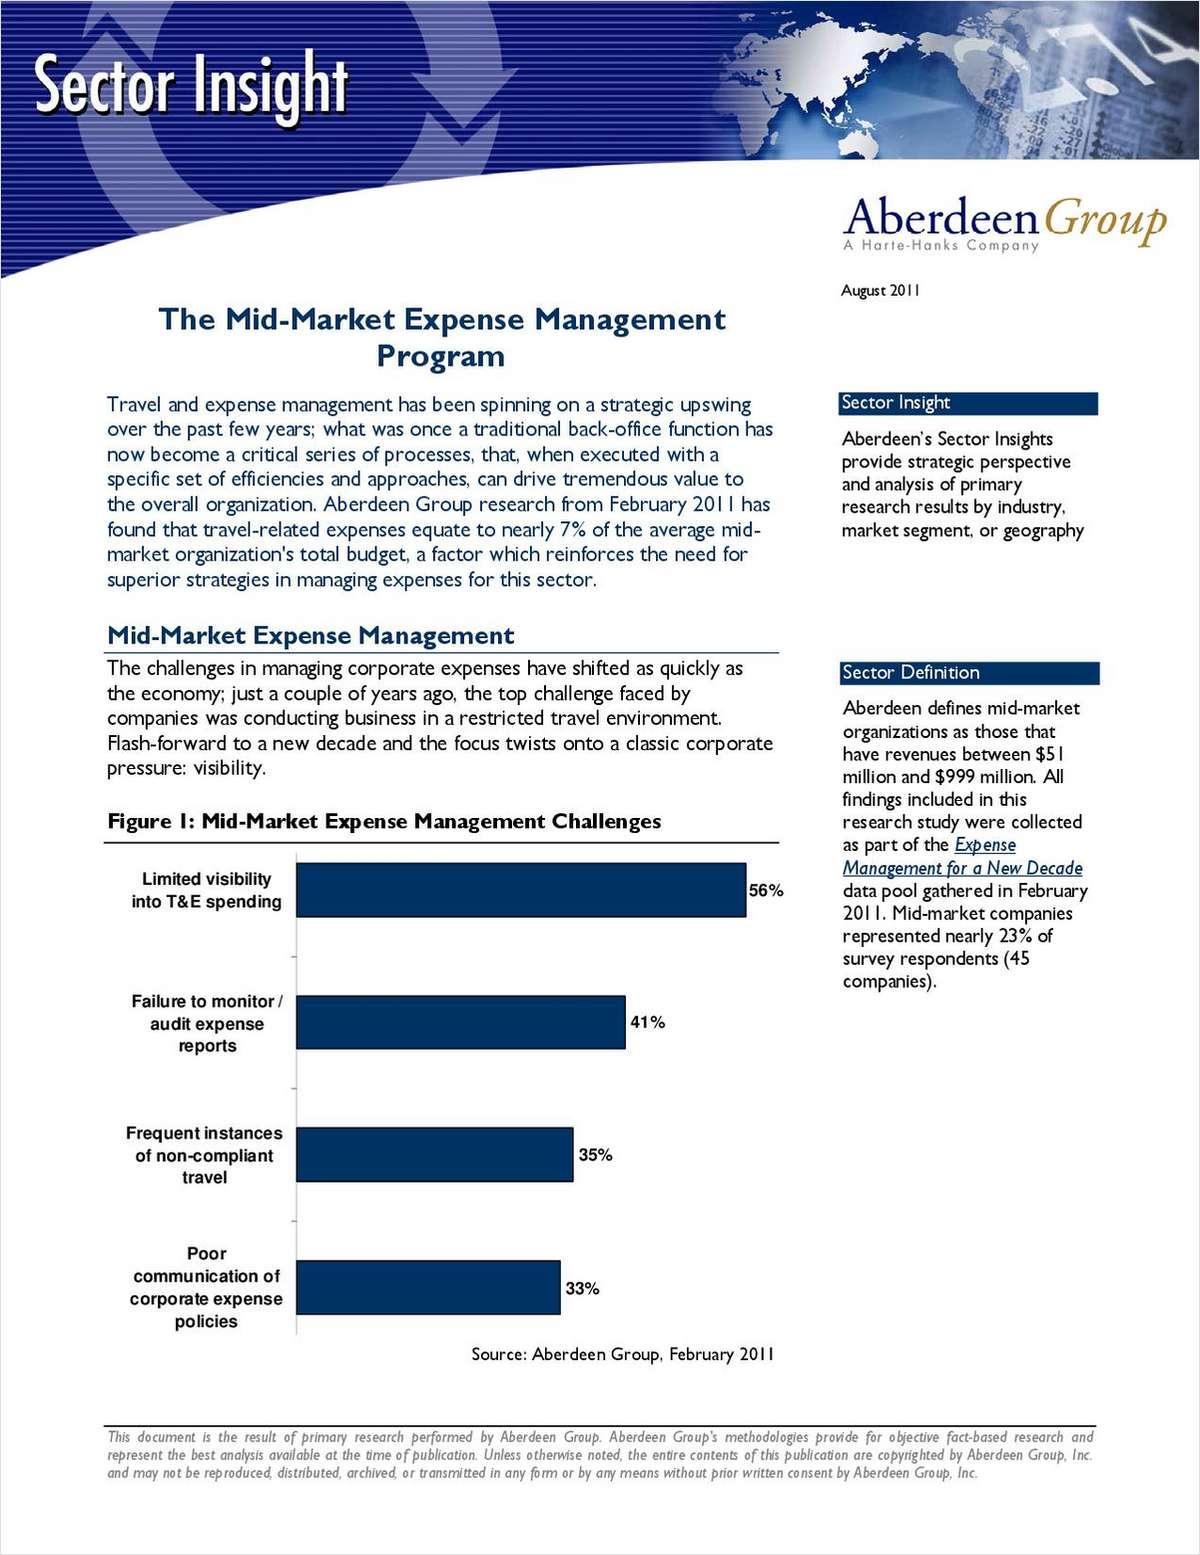 The Mid-Market Expense Management Program